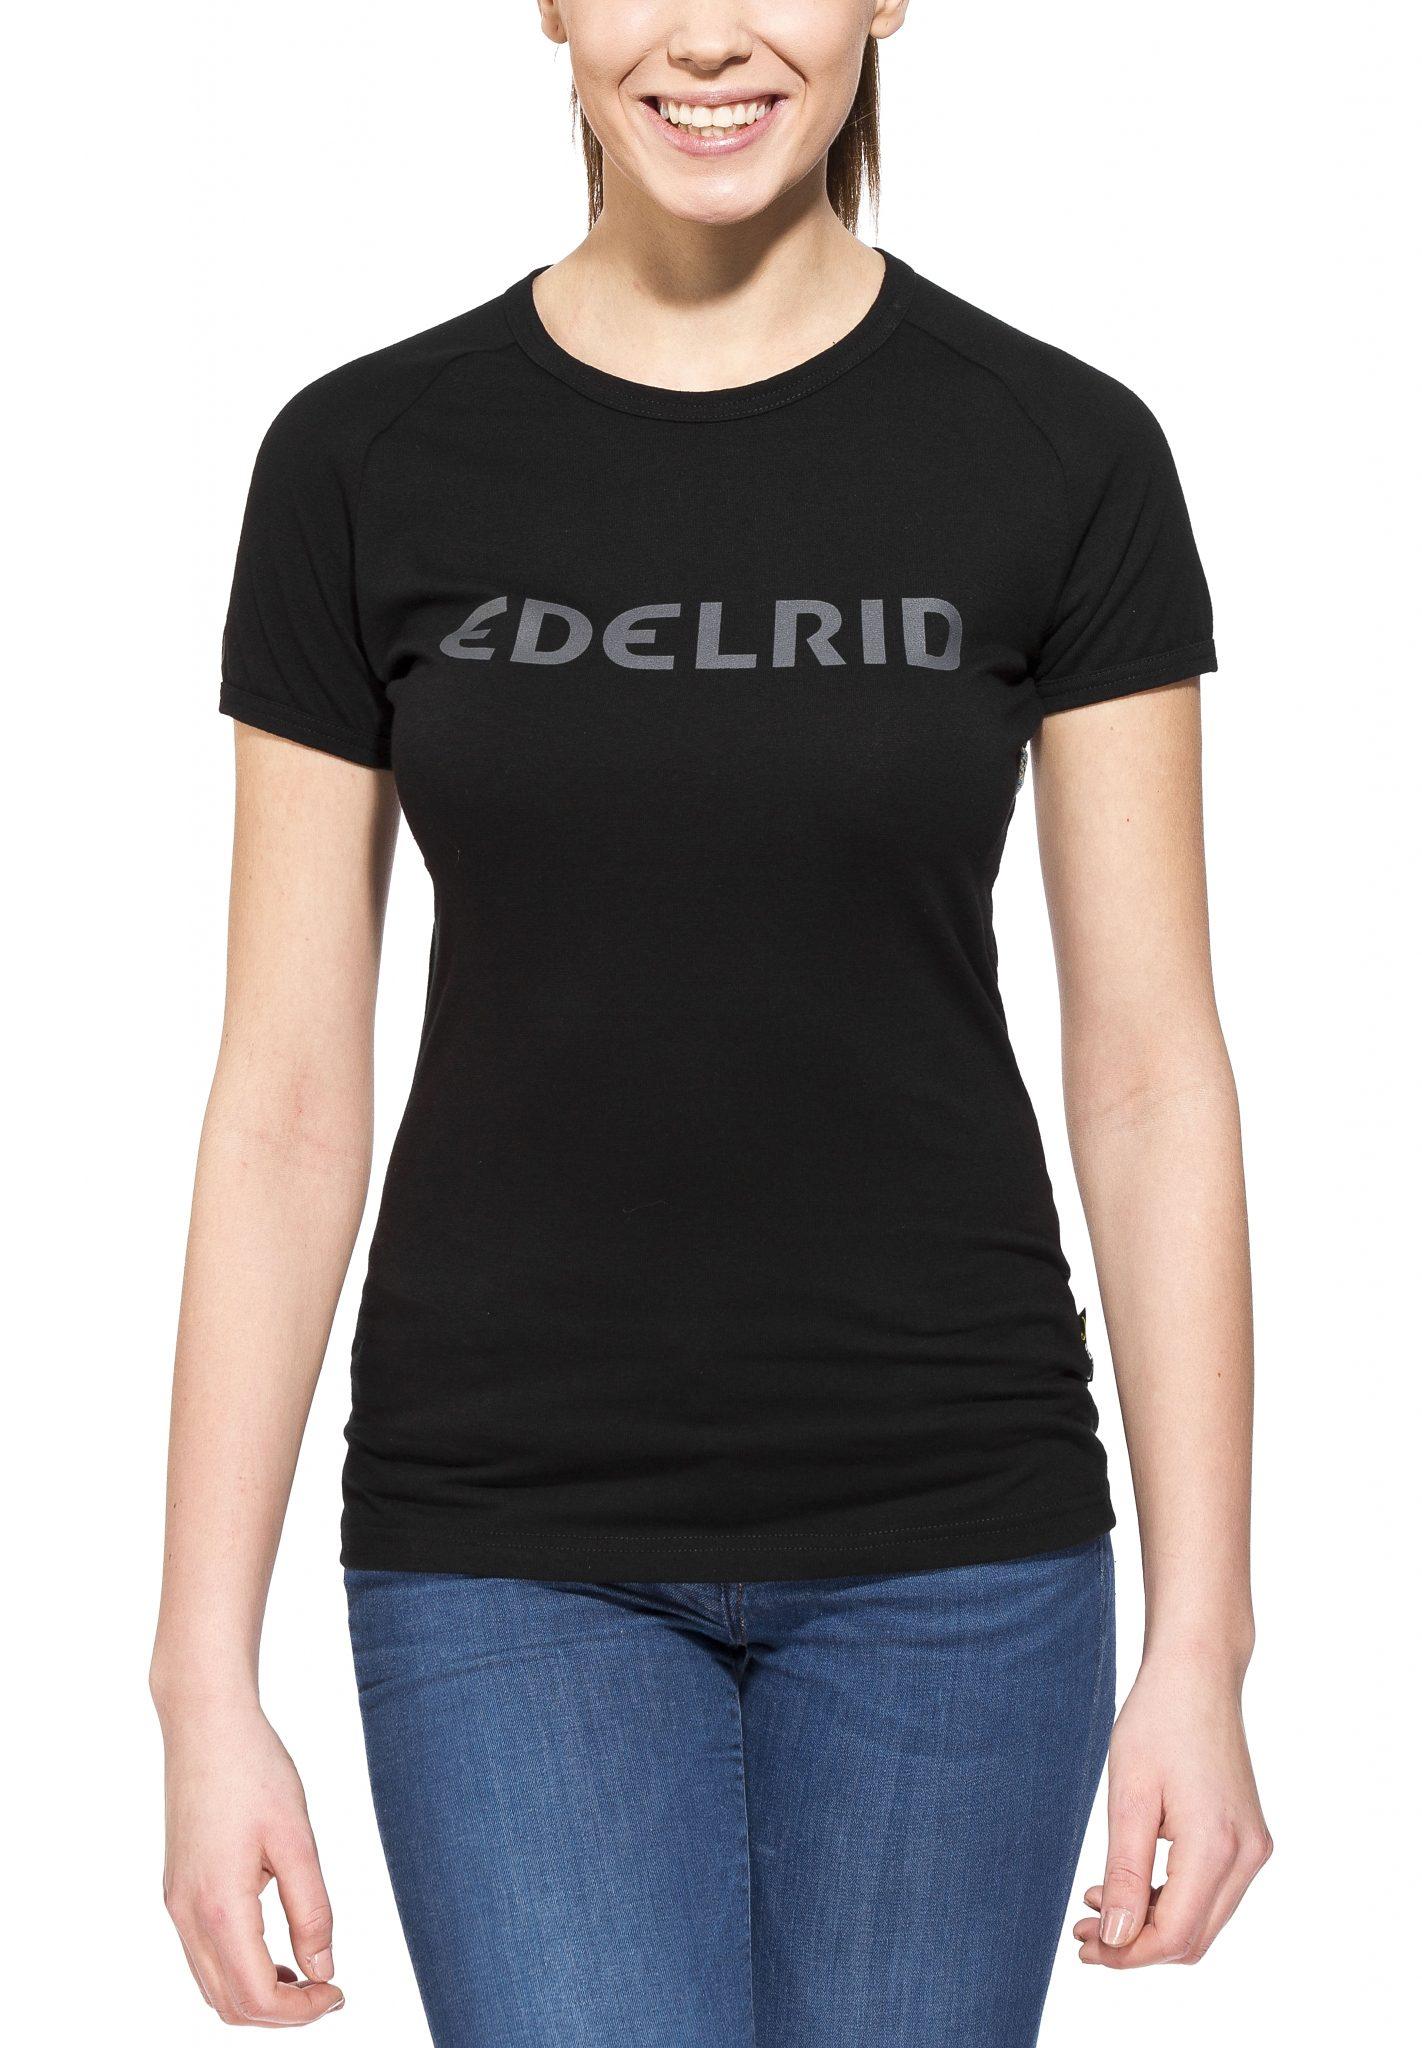 Edelrid T-Shirt »Rope«